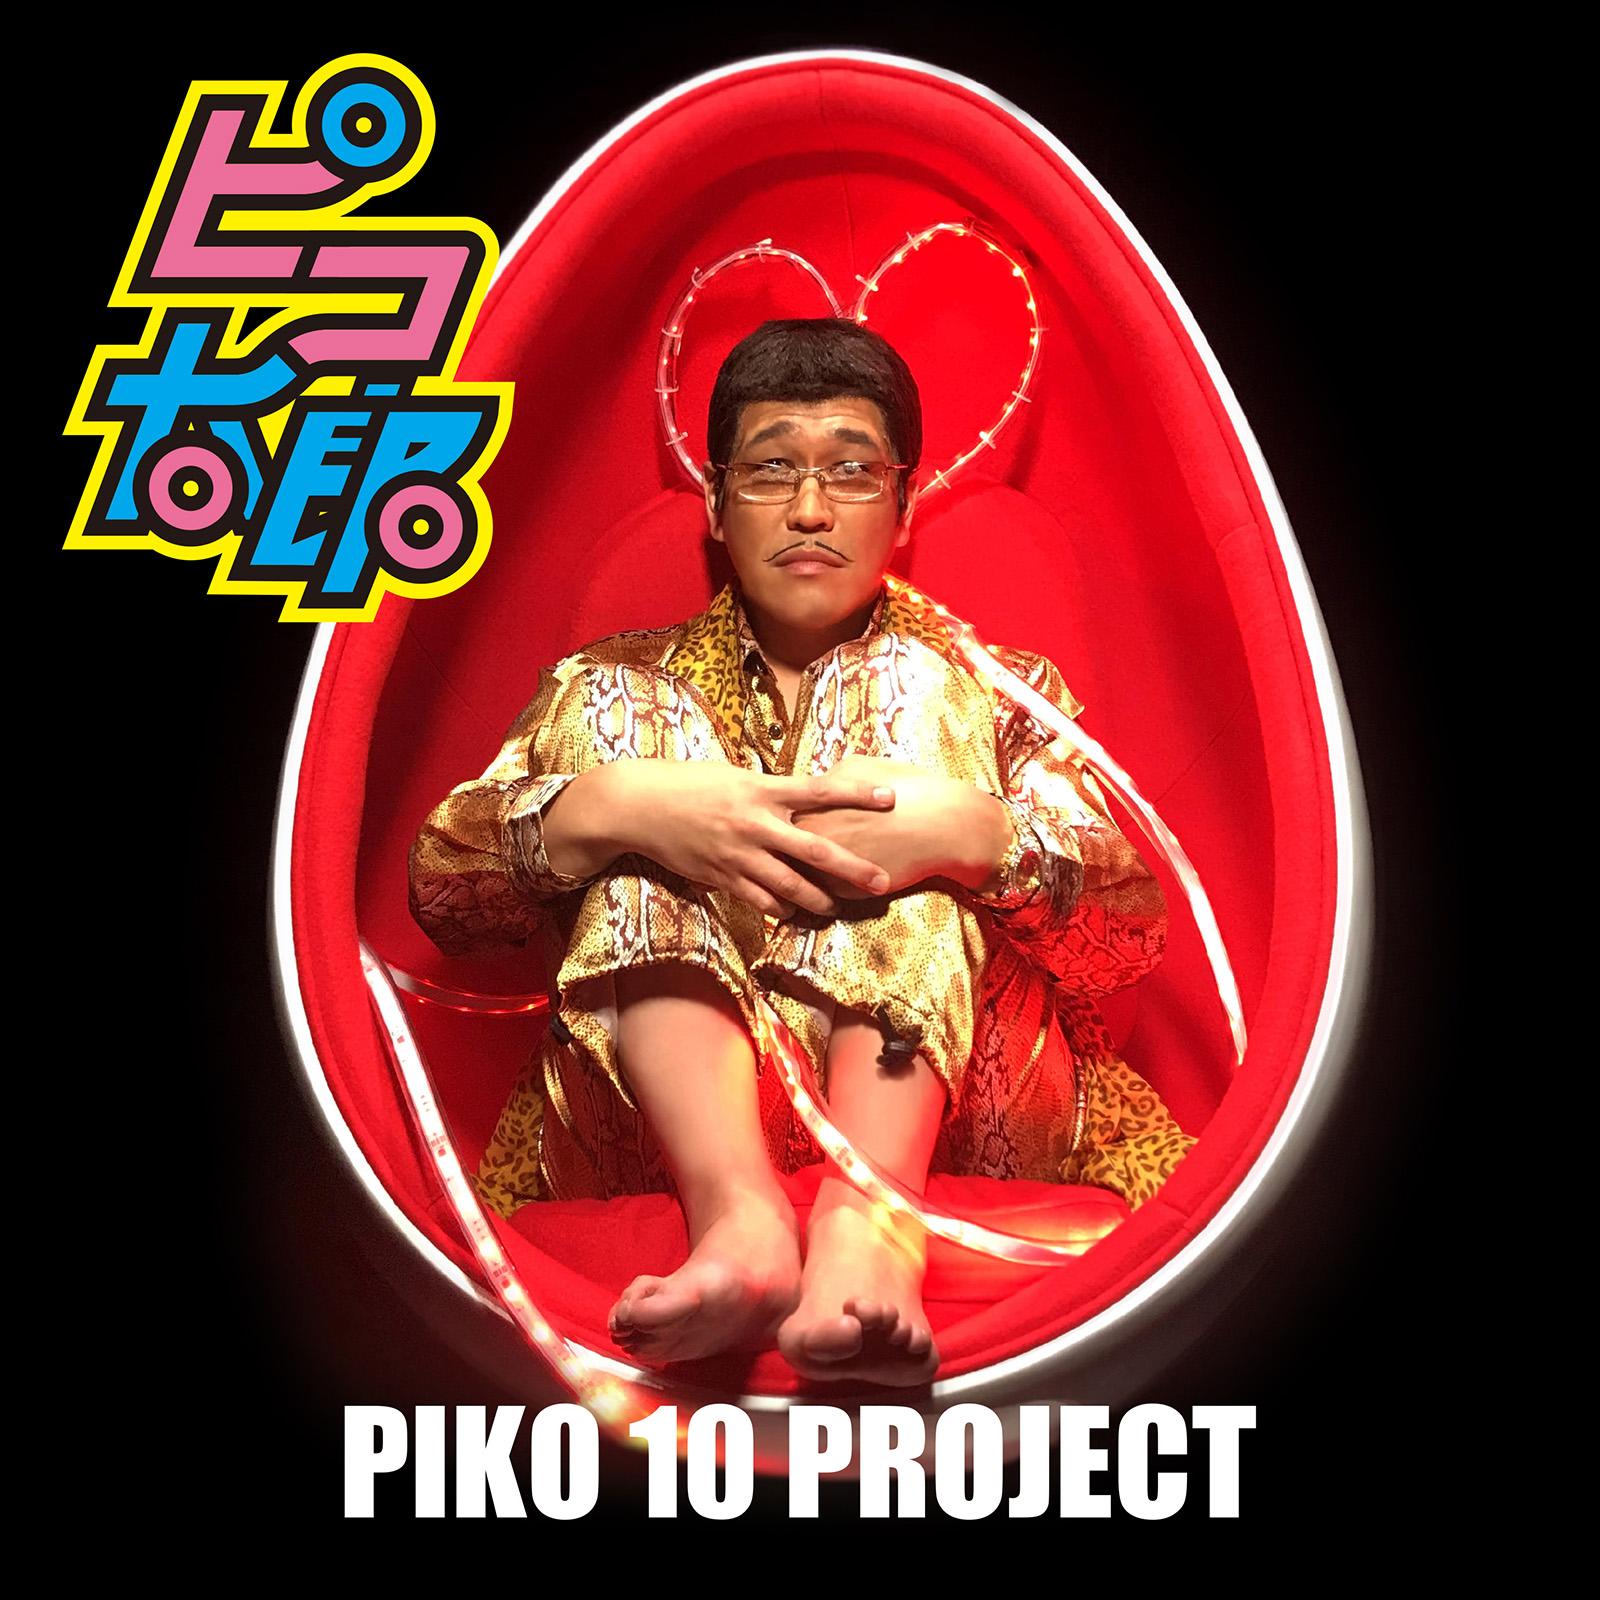 Pikotaro Piko 10 Project